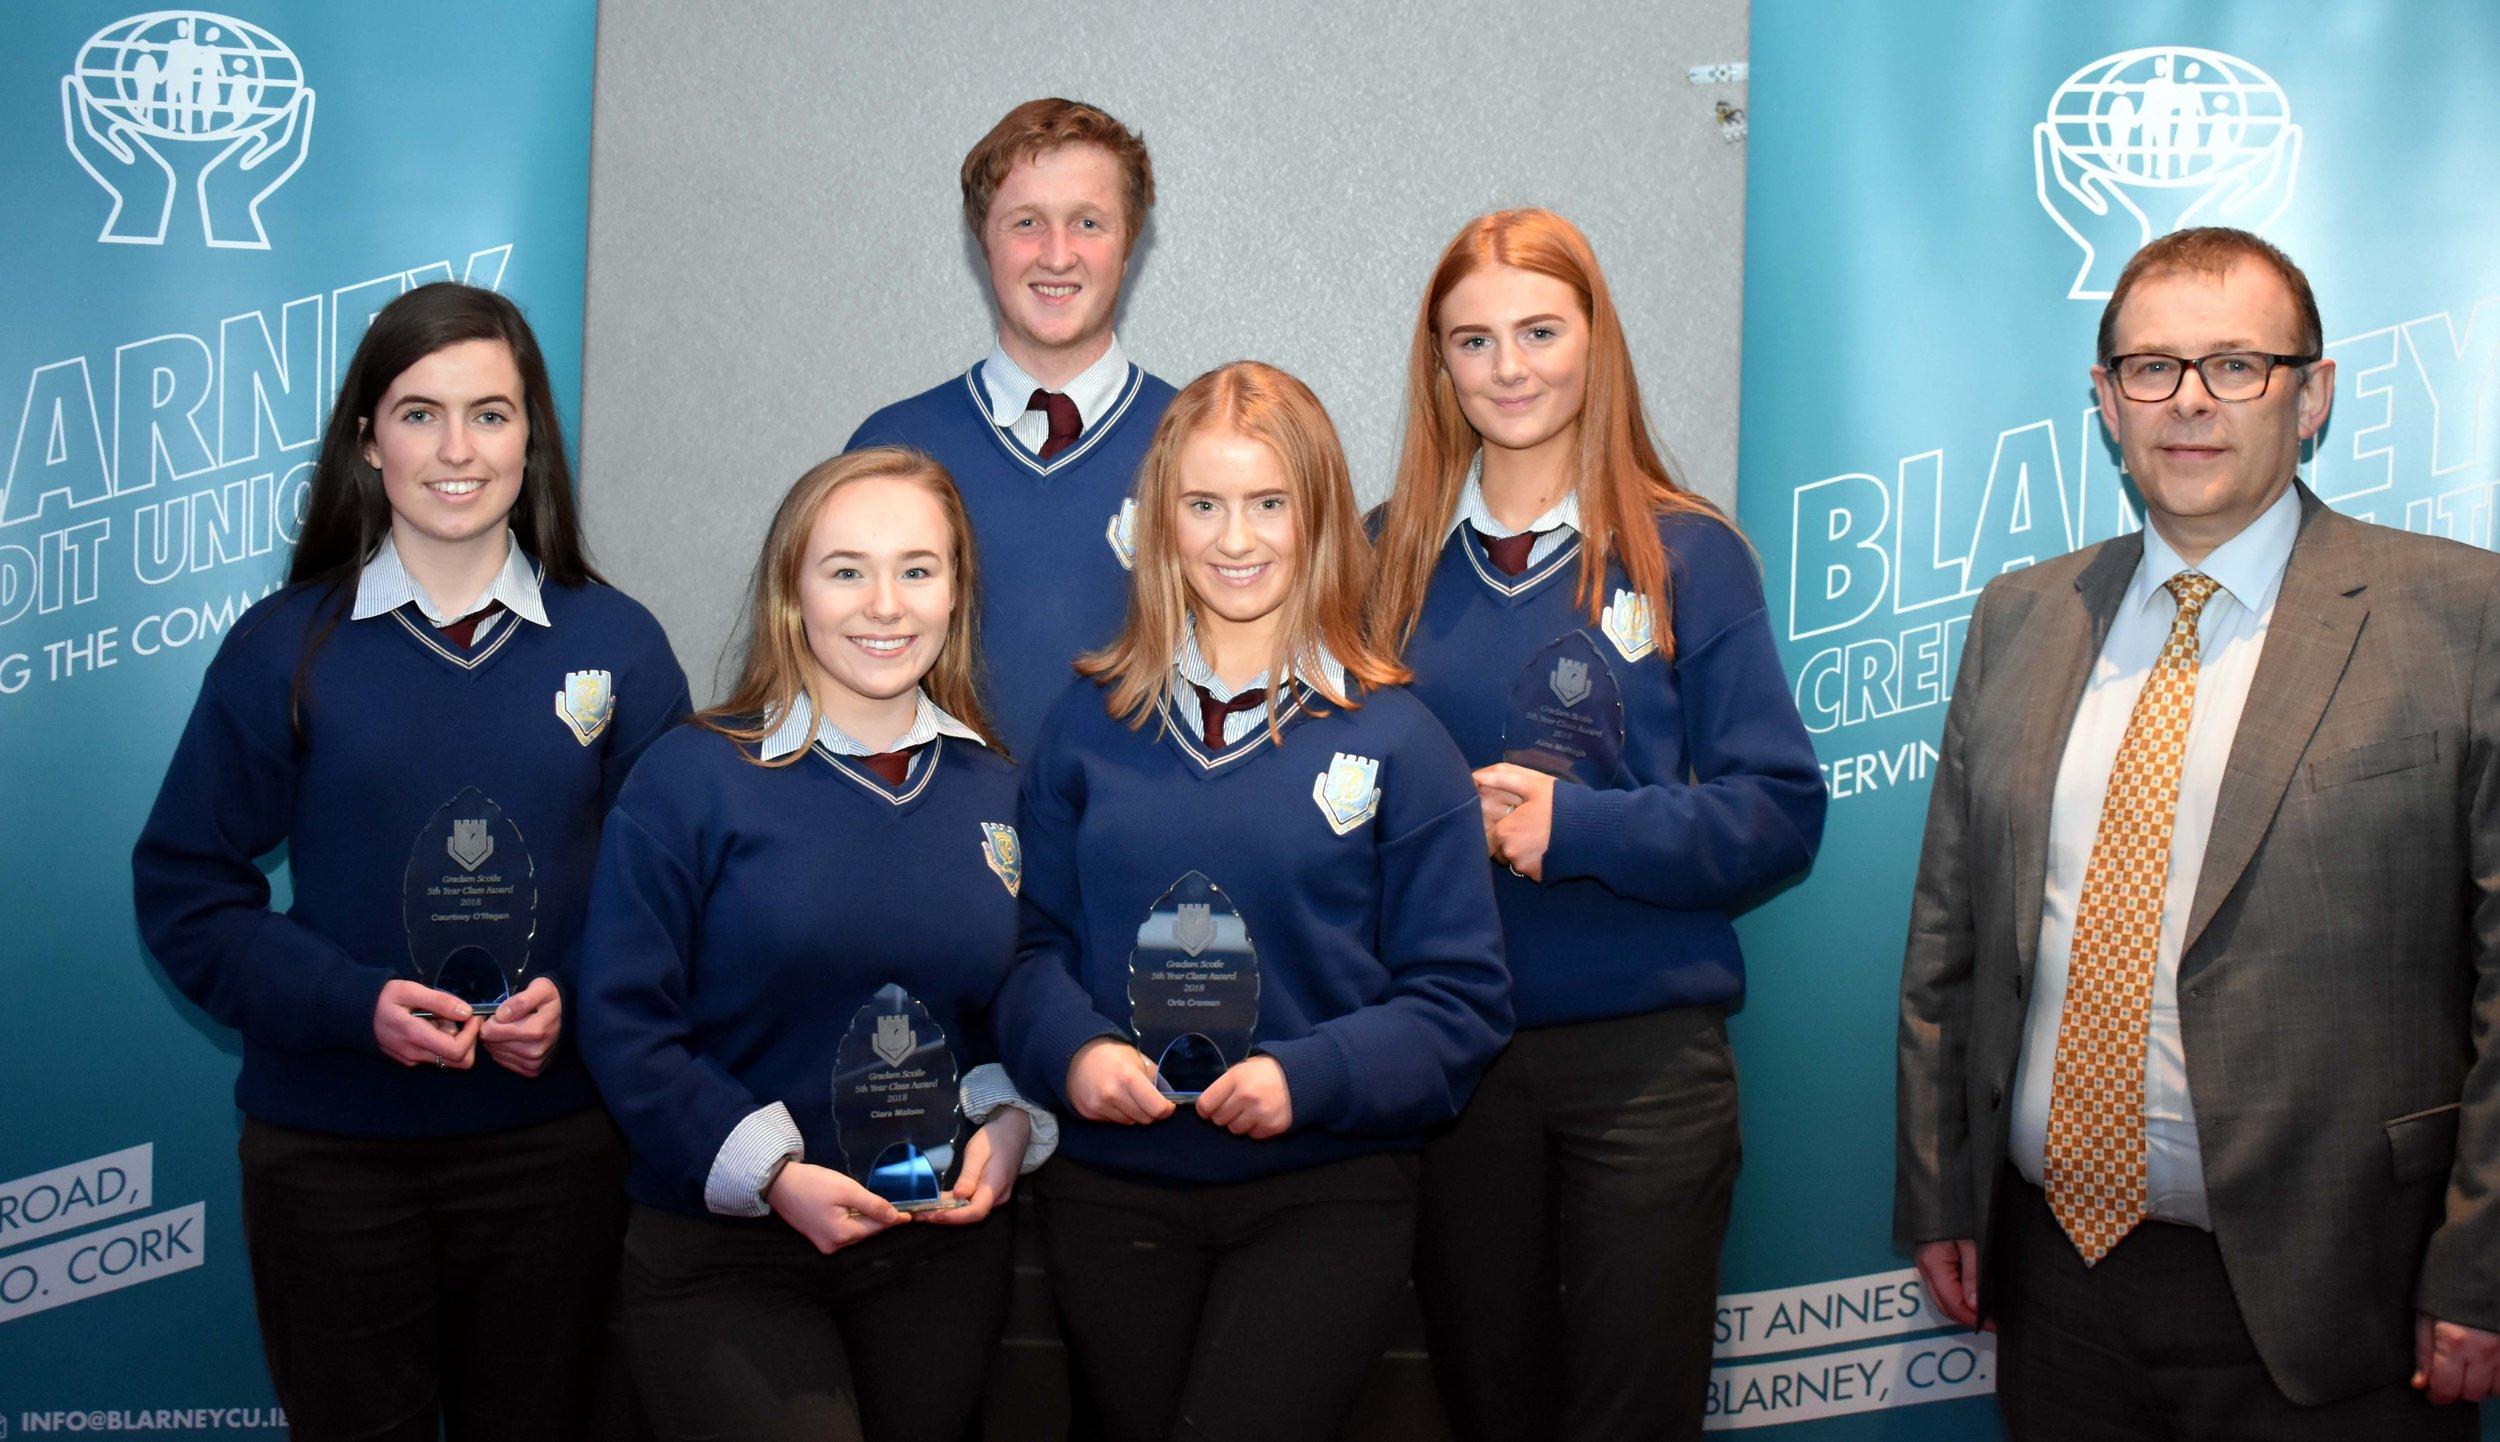 5th Year Class Award Winners: (Back L-R) Courtney O' Regan, Seanán Jones, Áine McHugh, (Front L-R) Ciara Malone, Orla Cremen. (Pictured with Mark McGloughlin - BOM and Blarney Credit Union)